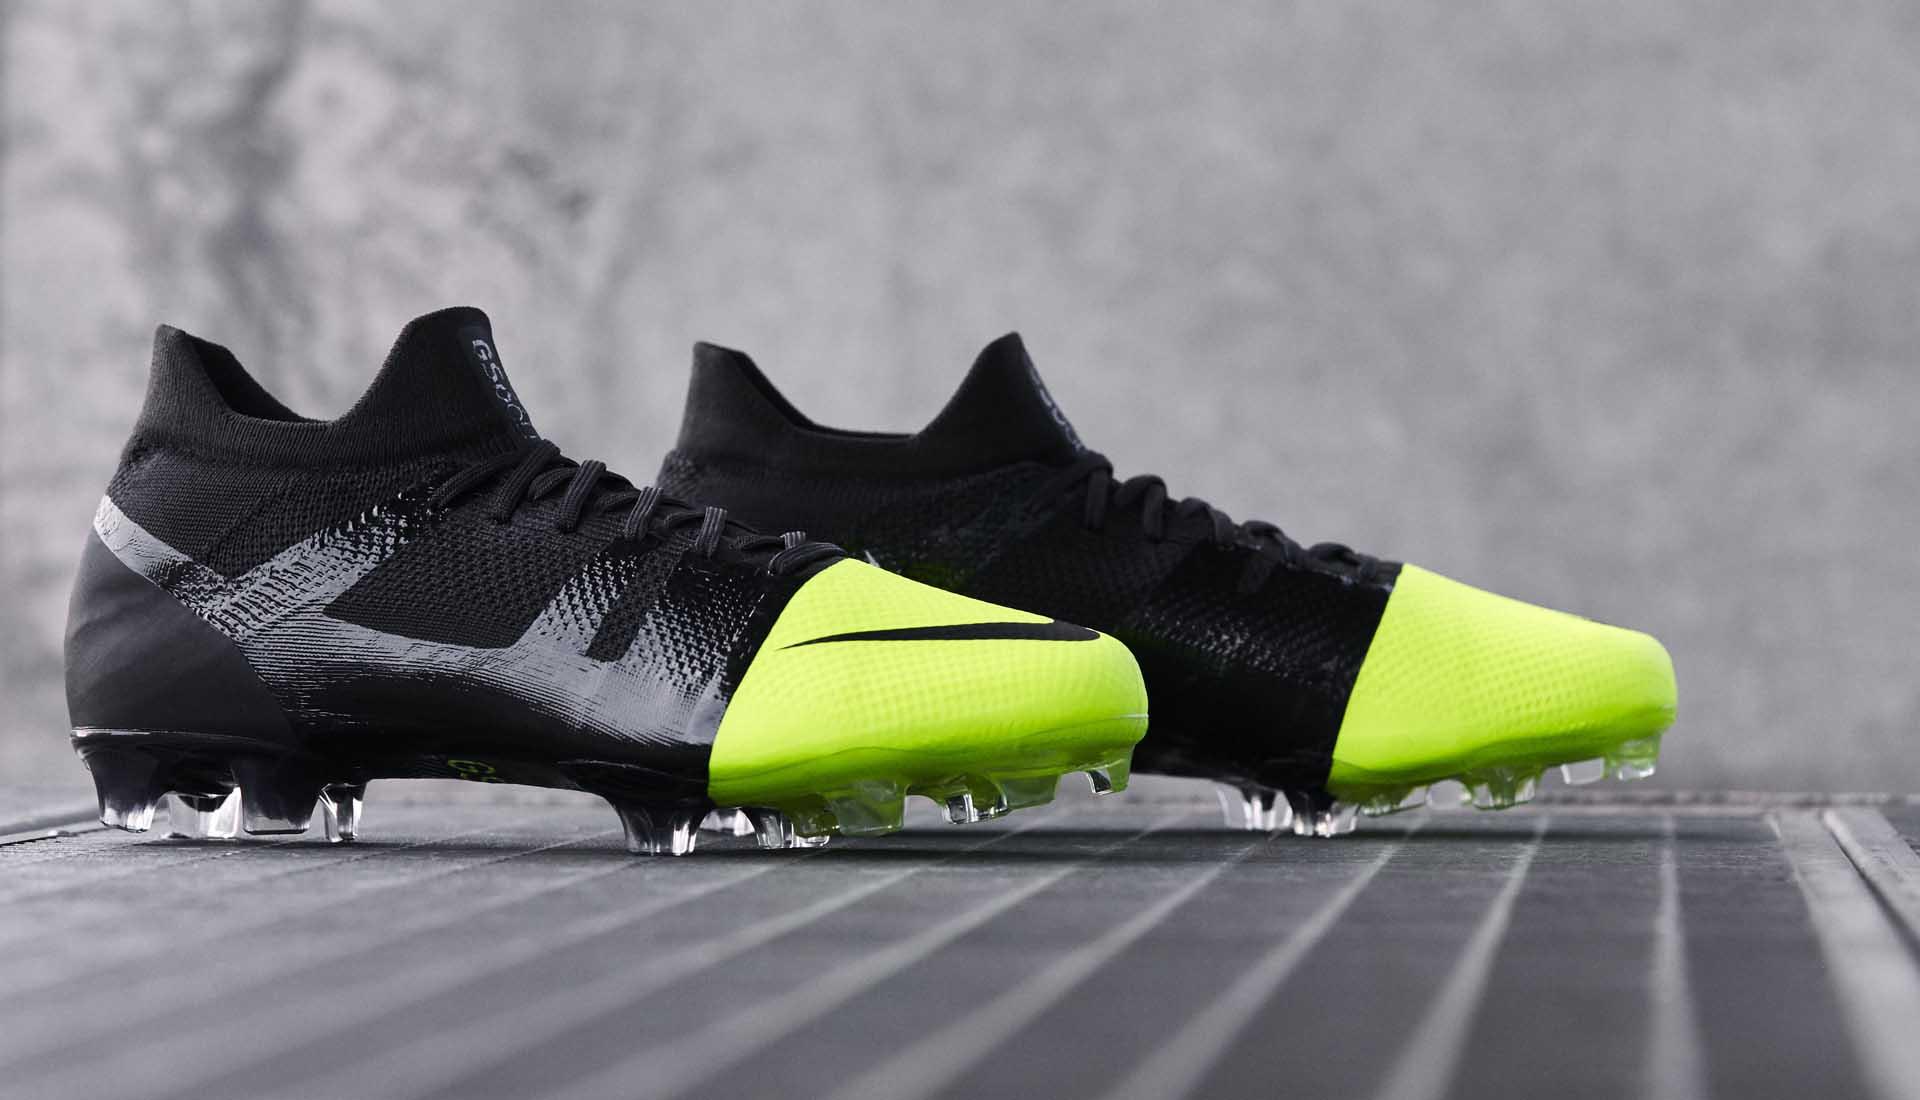 100% authentic a7956 2c8df Nike Mercurial Superfly GS 360. scarpe calcio ...